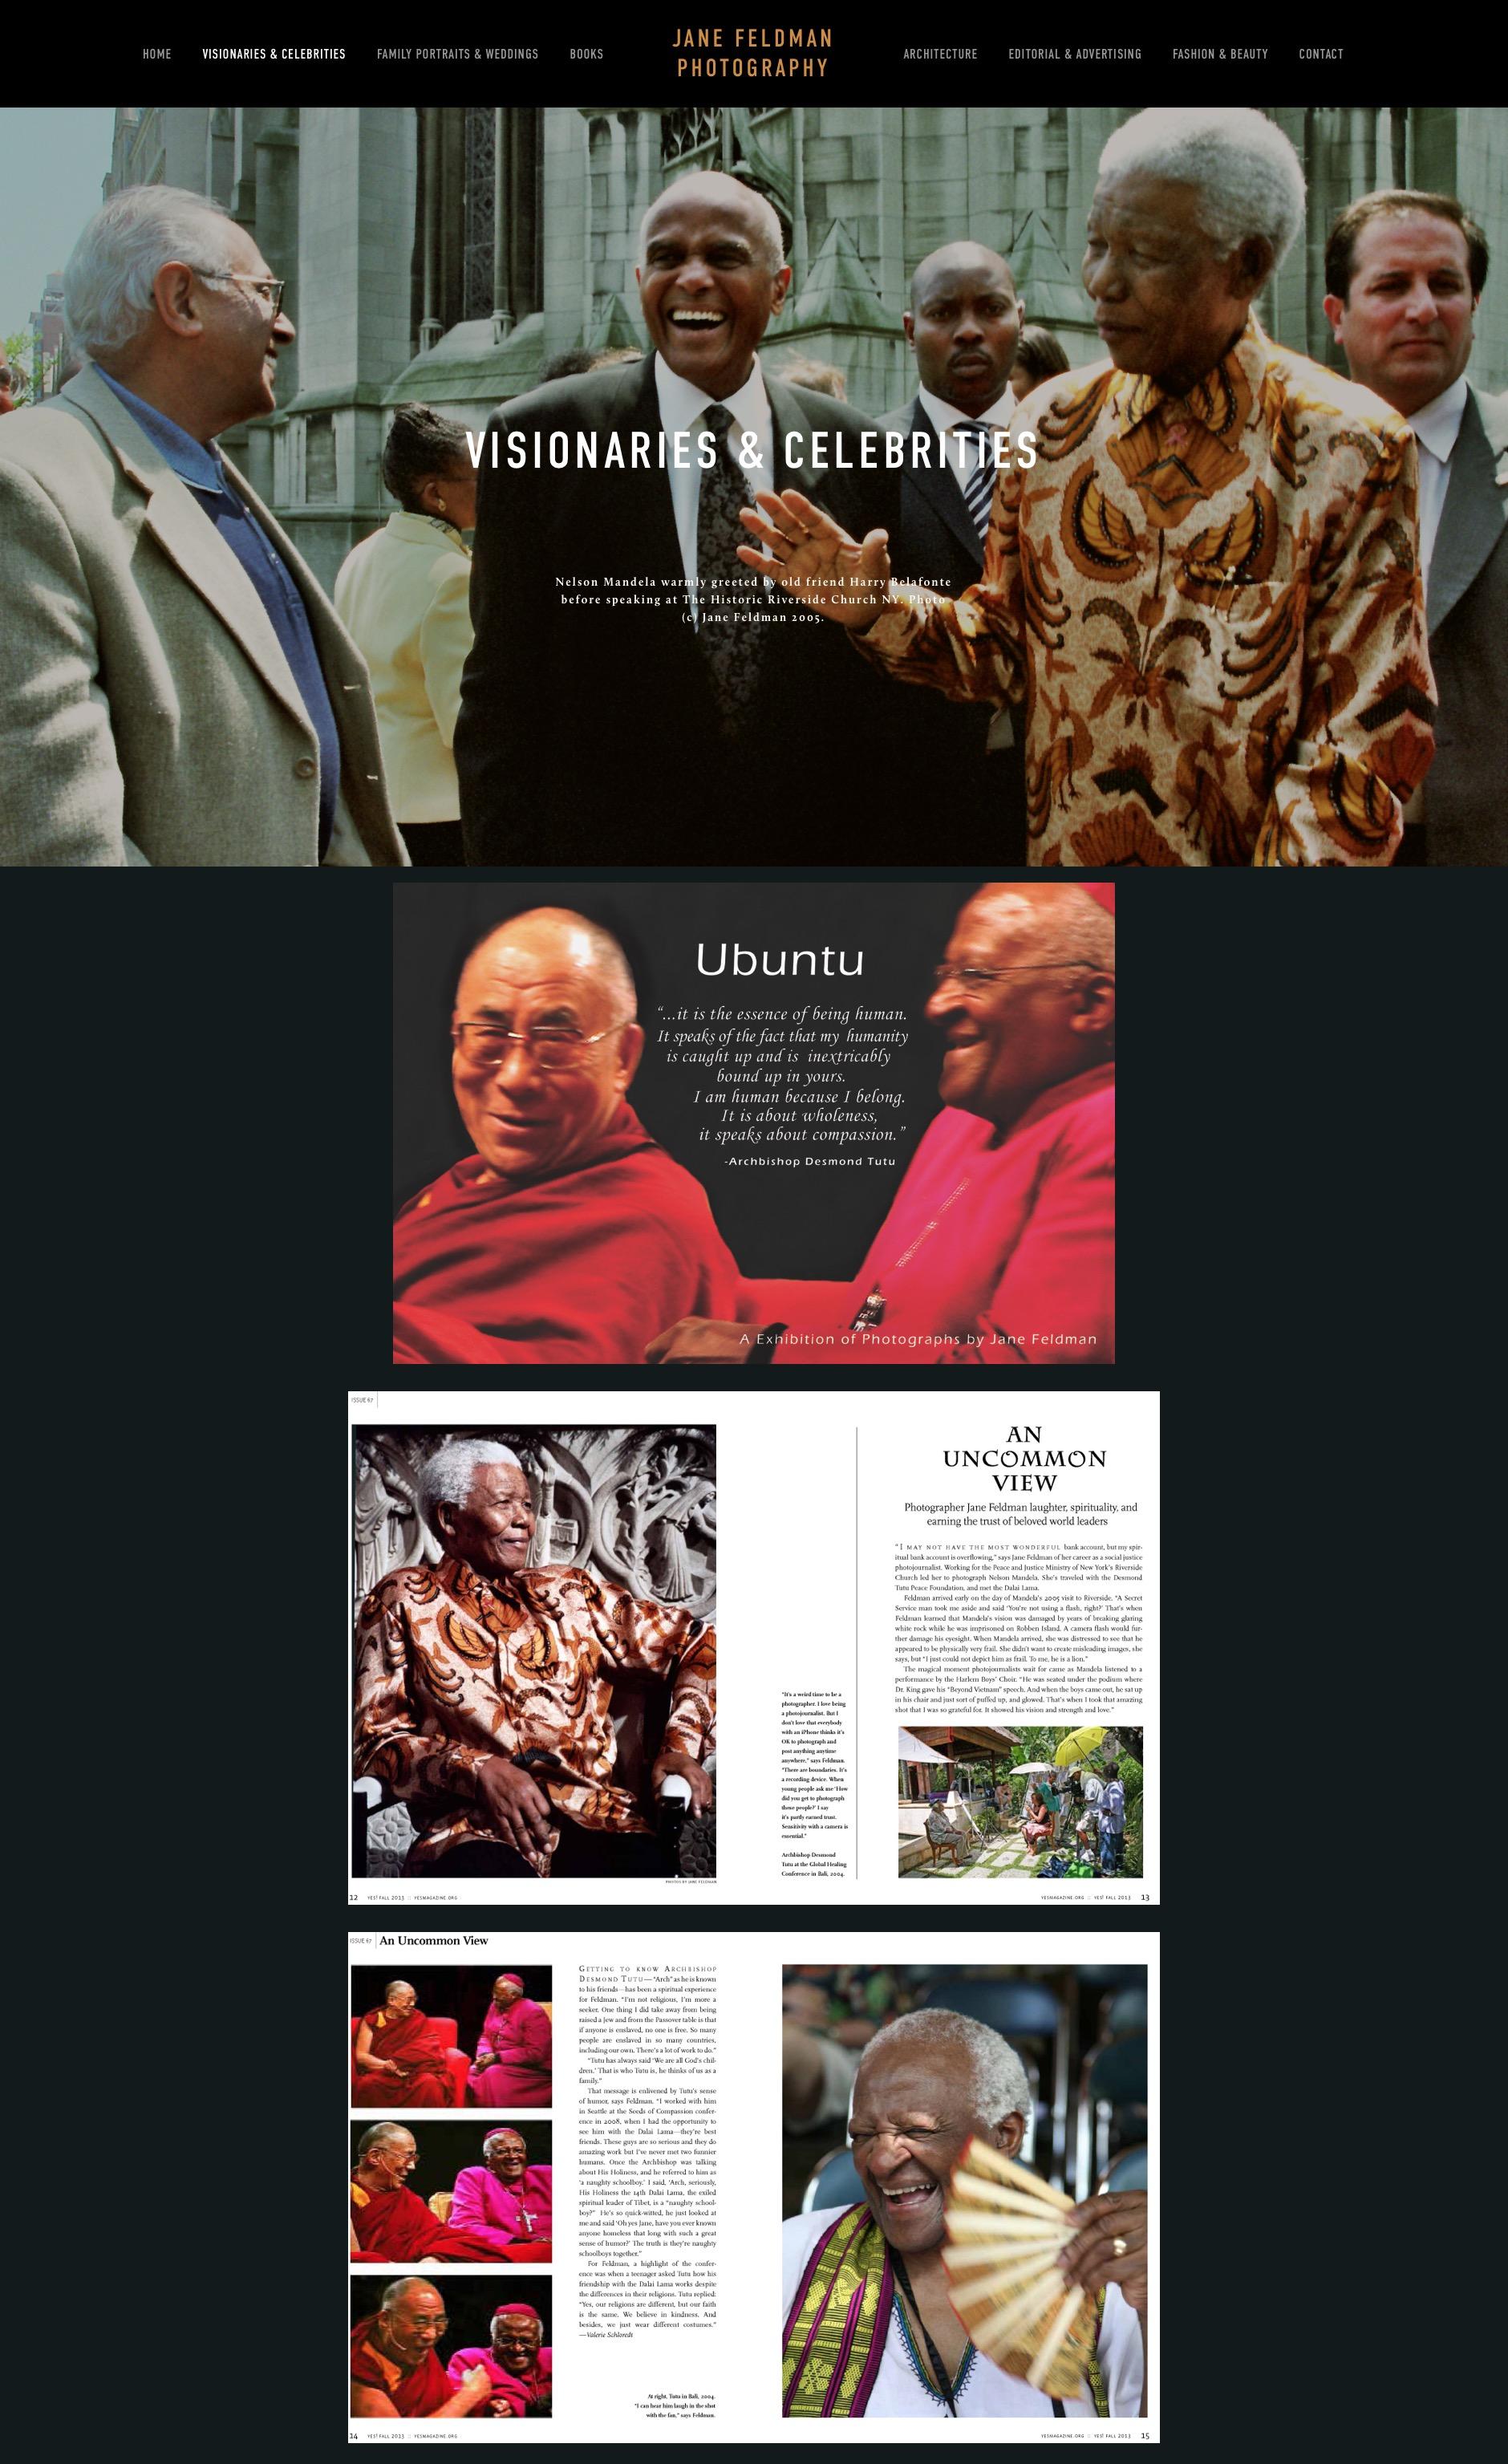 Complete Web Design www.janefeldman.com